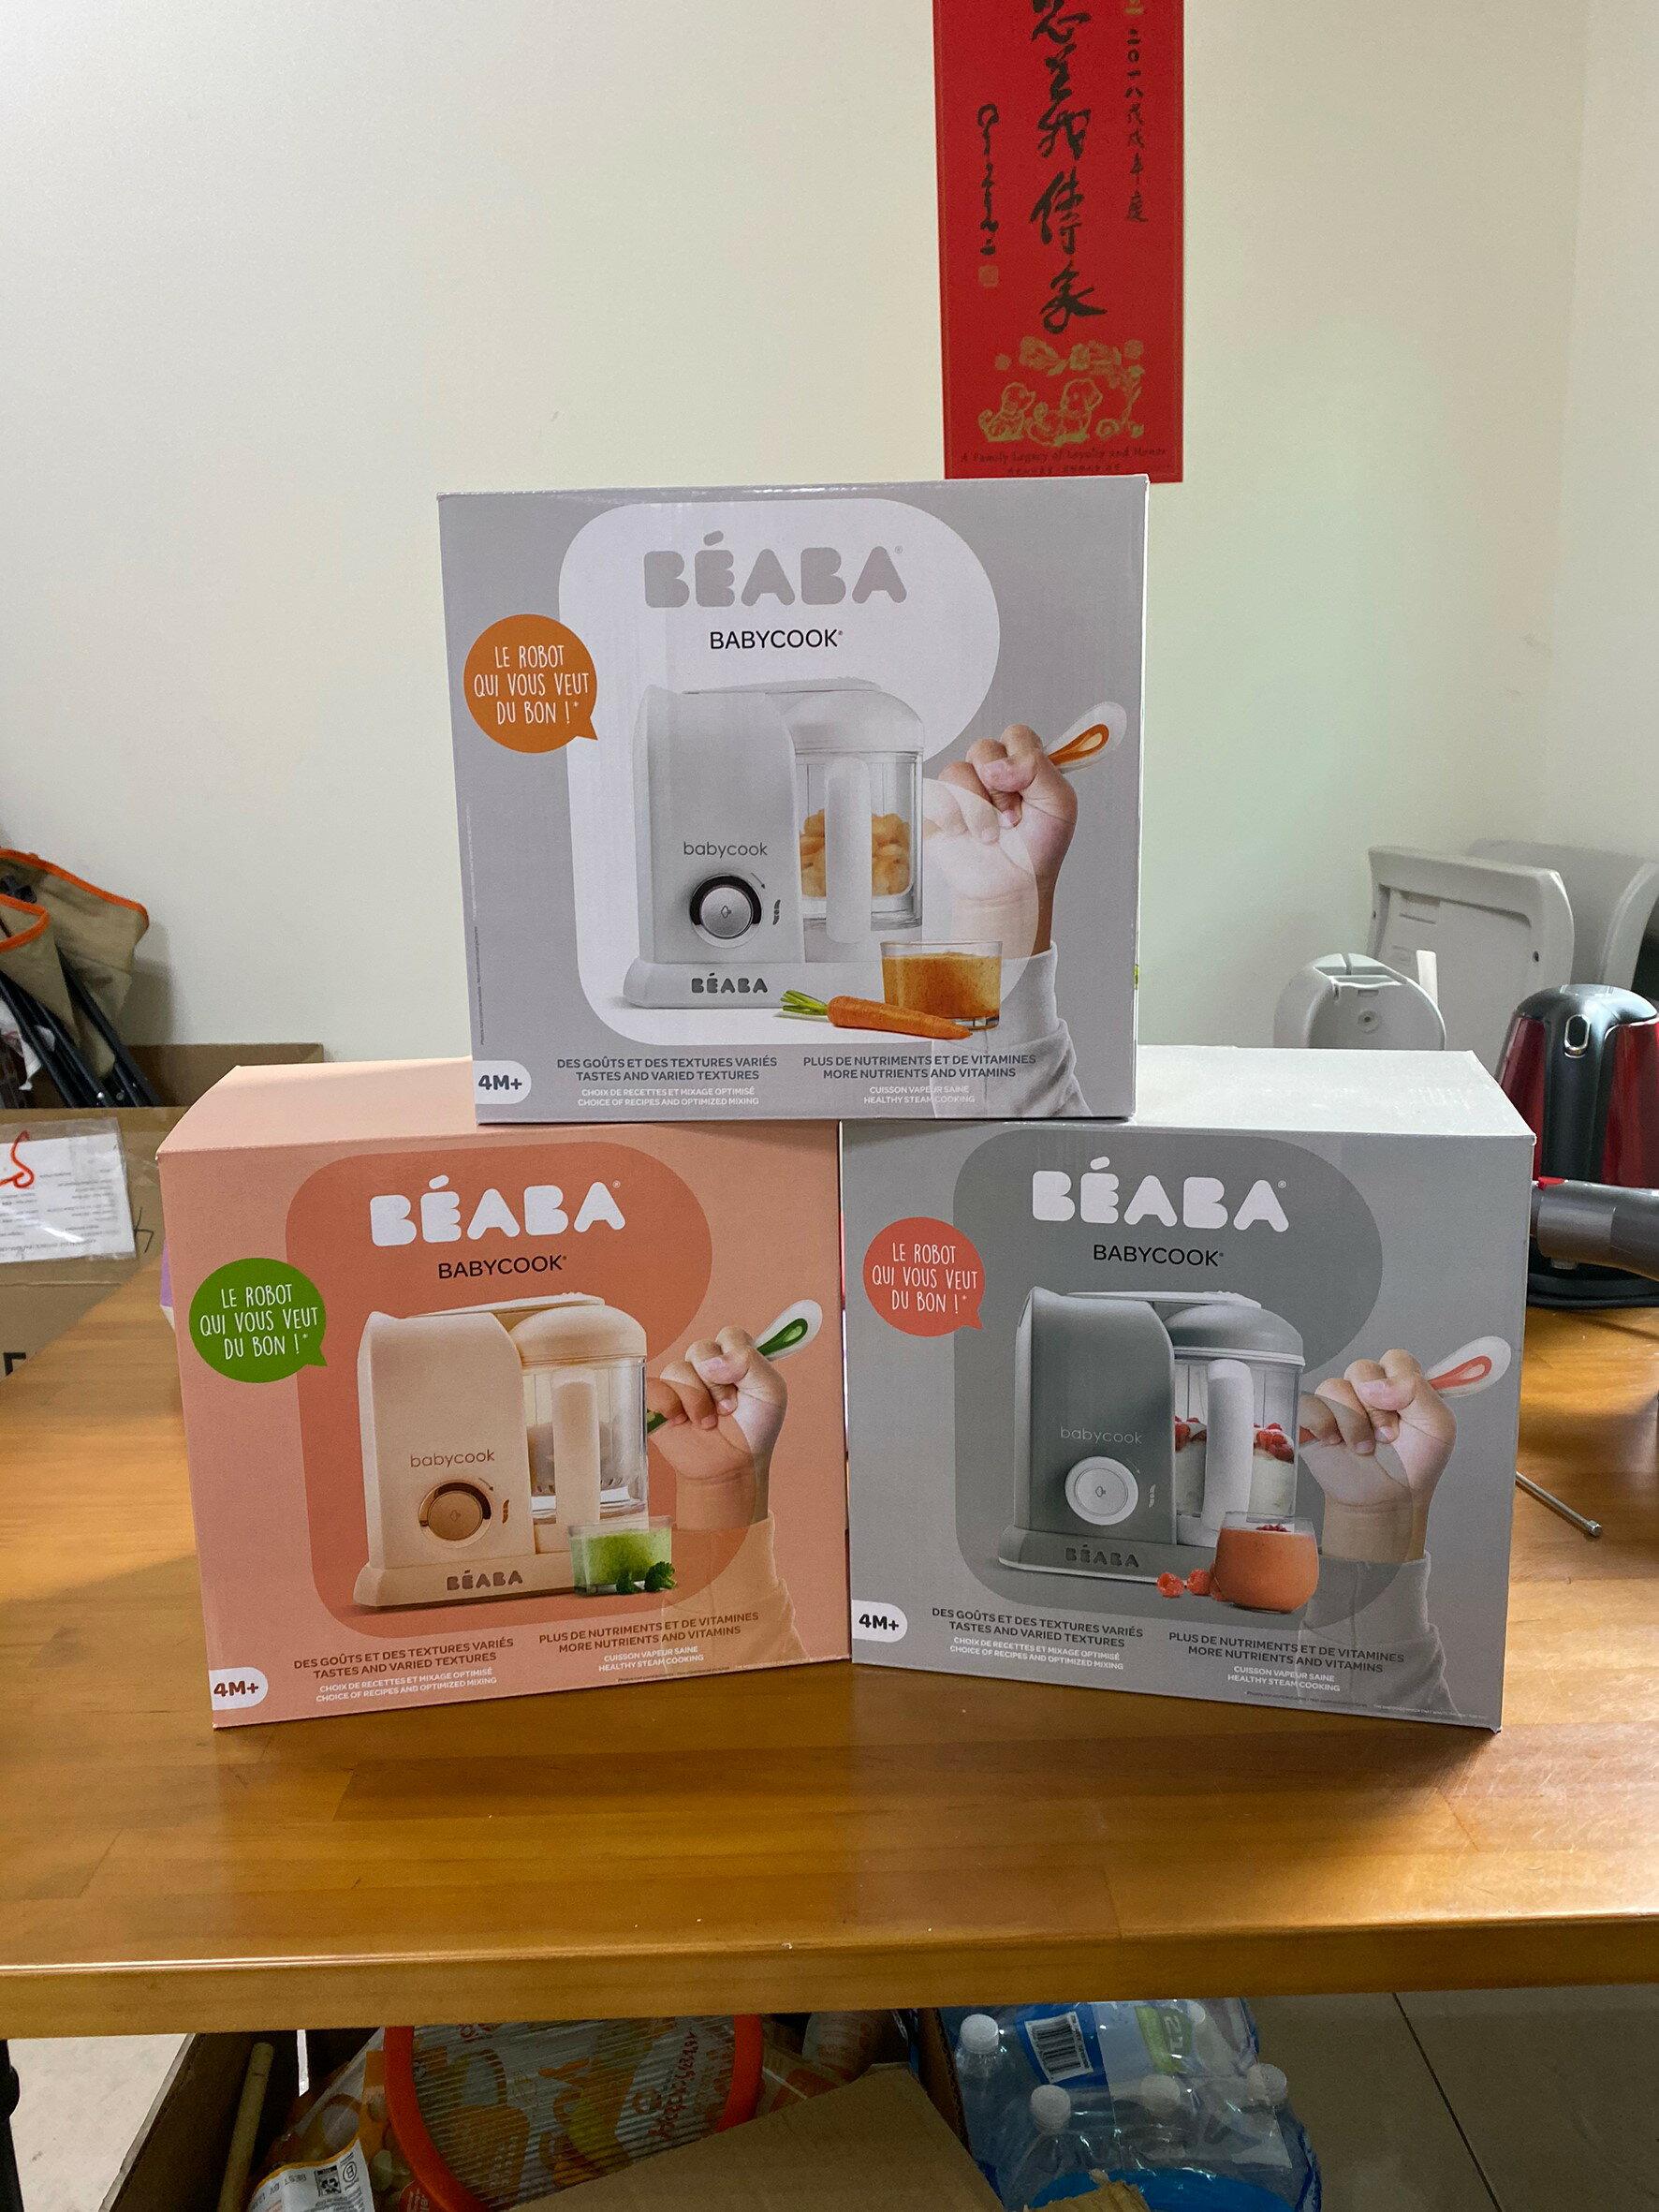 【onemore】美國代購100%正品法國Beaba Babycook Pro 嬰兒副食品調理機 /副食品調理機/副食品製作